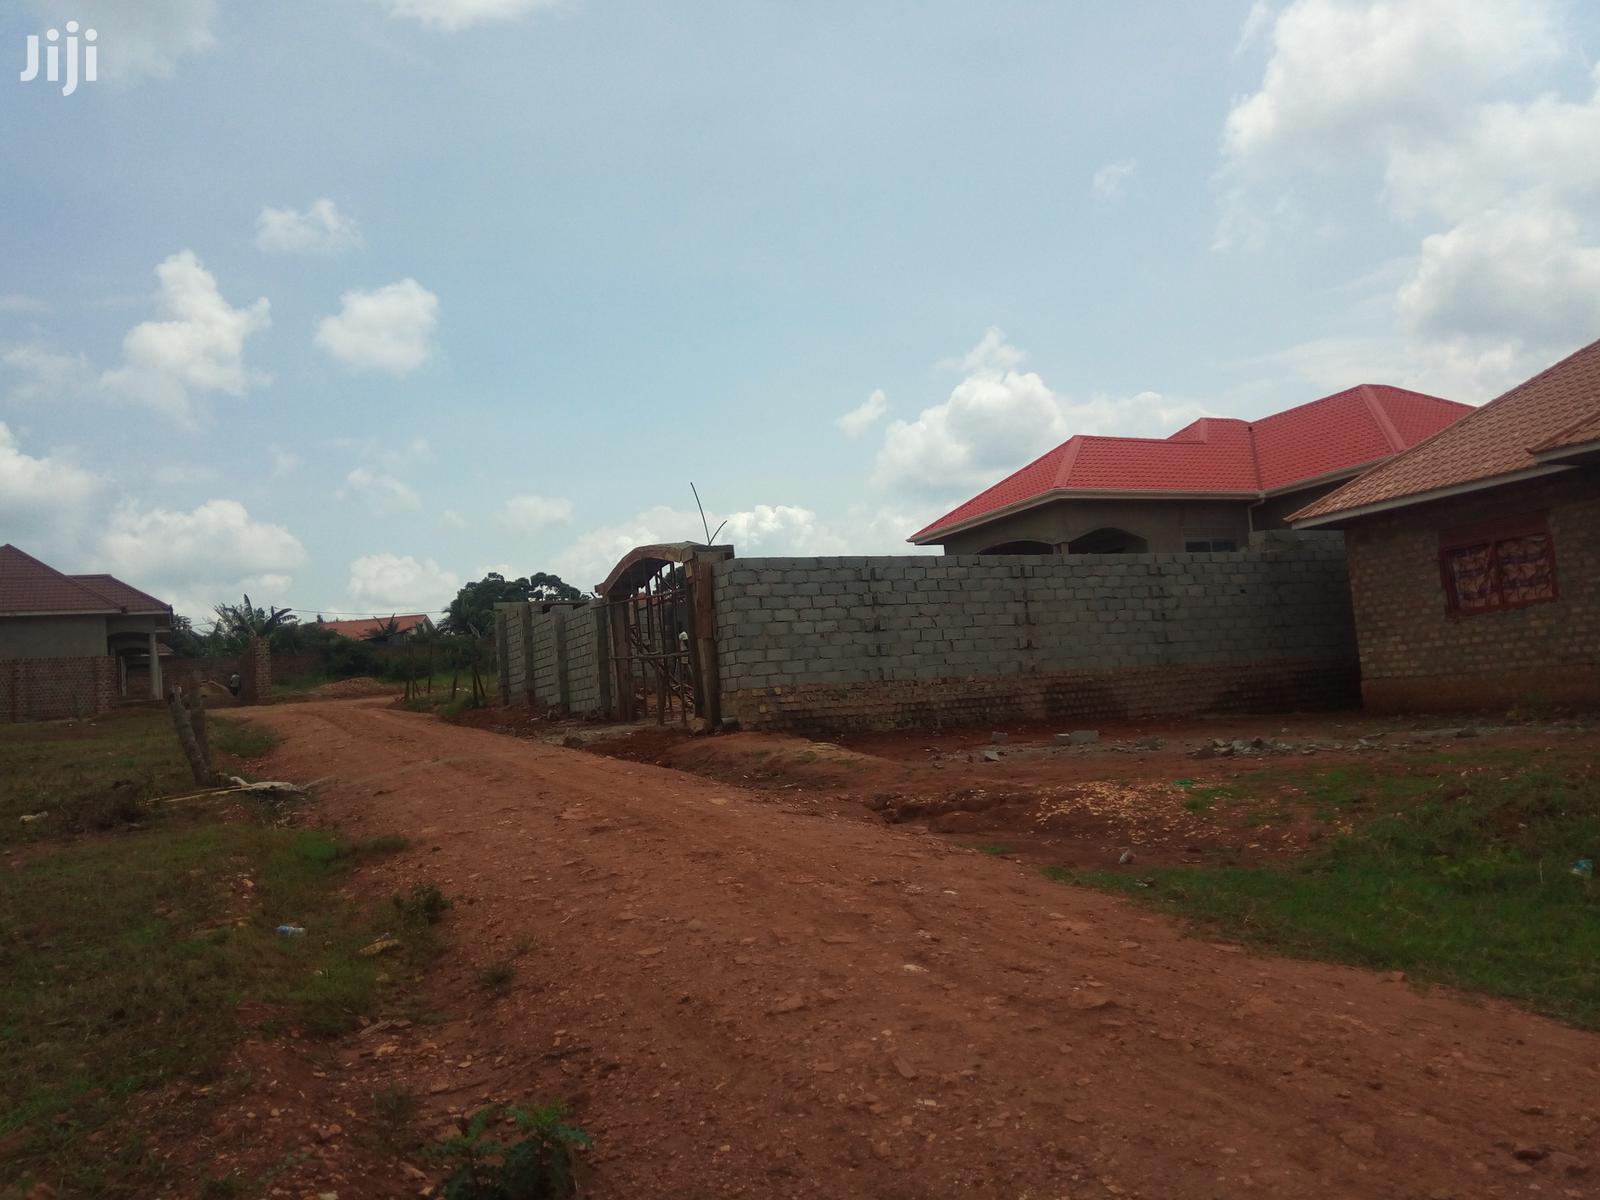 Plot Of Land For Sale In Kira | Land & Plots For Sale for sale in Kampala, Central Region, Uganda